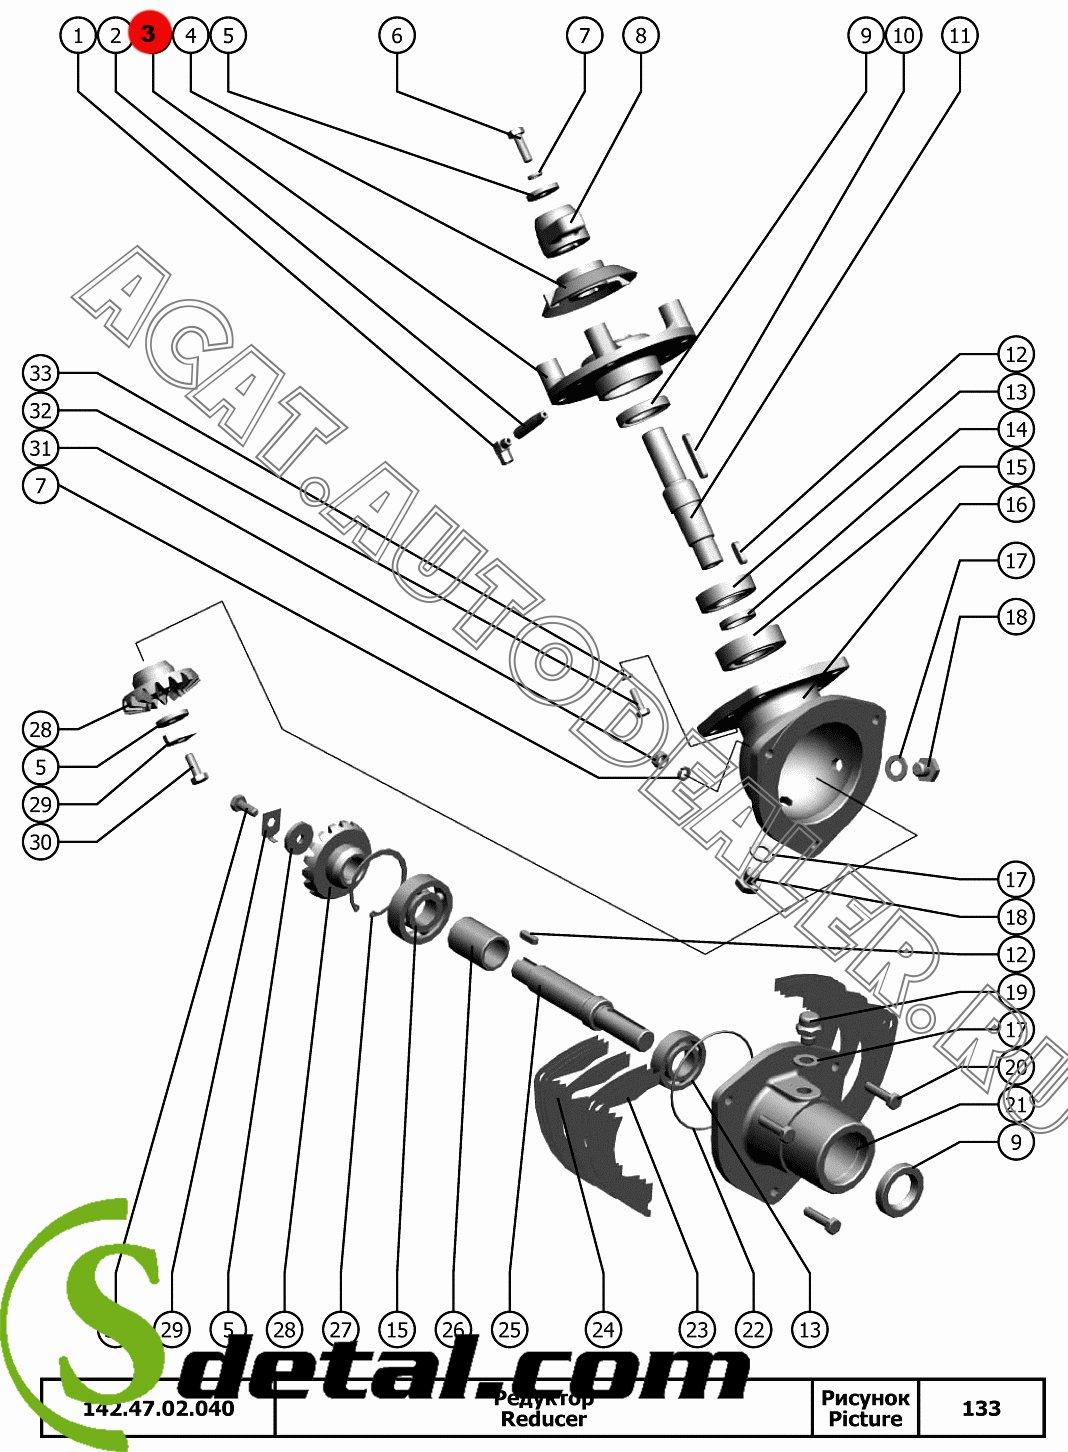 Крышка РСМ-10.01.47.103Б редуктора наклонного Дон-1500